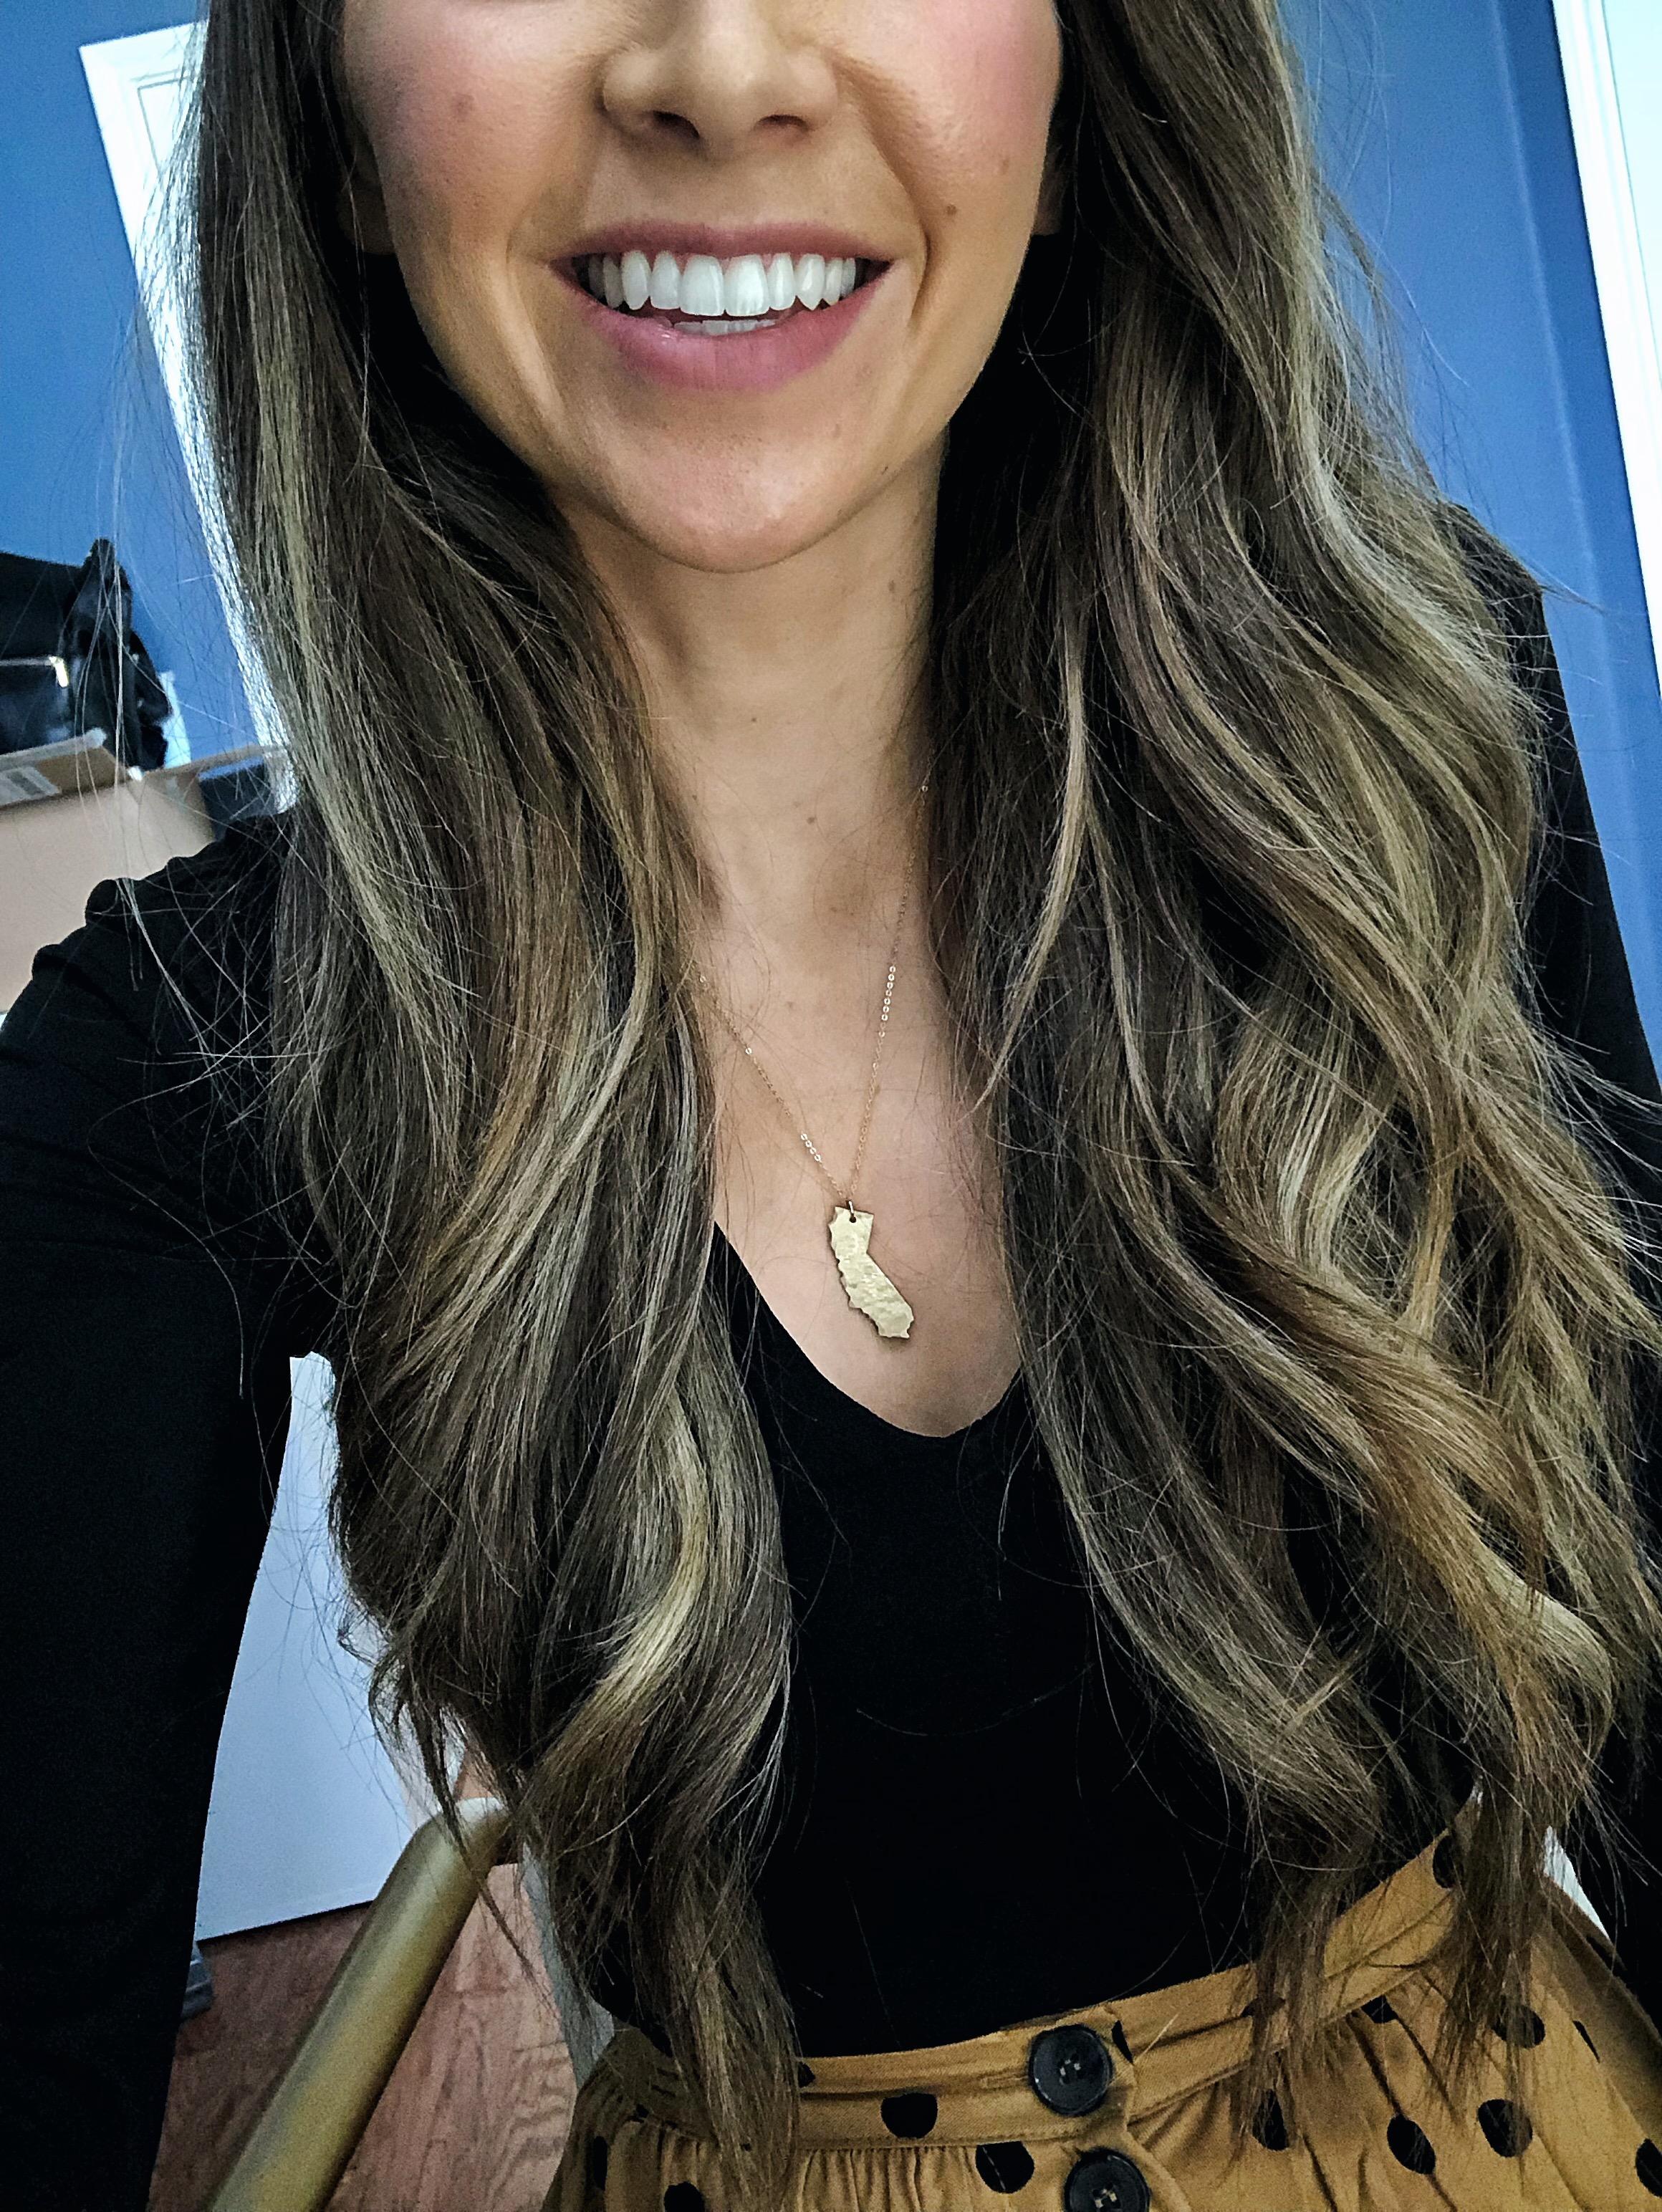 nashelle california hammered gold necklace